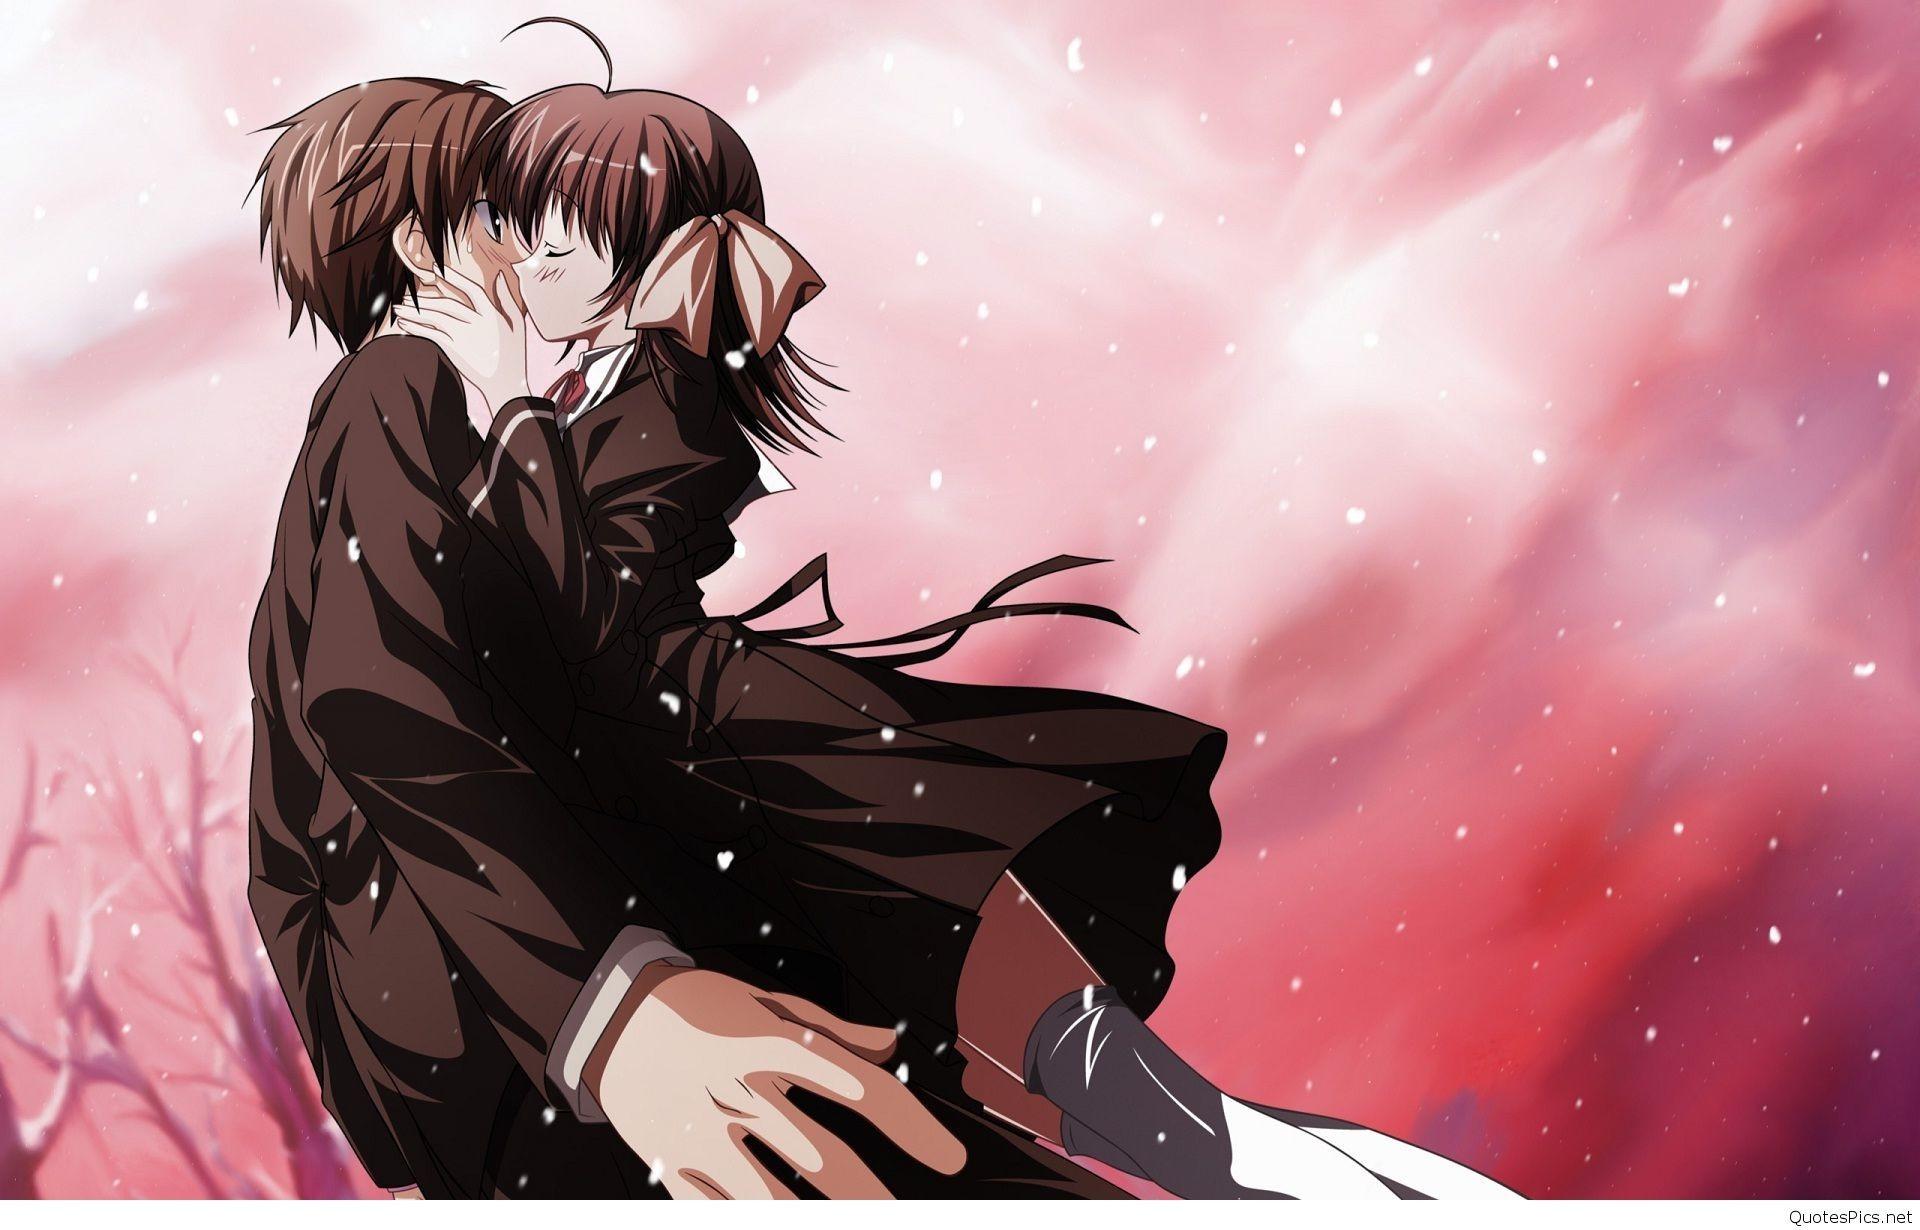 Cute Anime Couple Wallpaper A Data Src W Full 8 8 2 152054 Romantic Anime Wallpaper Hd 1920x1230 Wallpaper Teahub Io